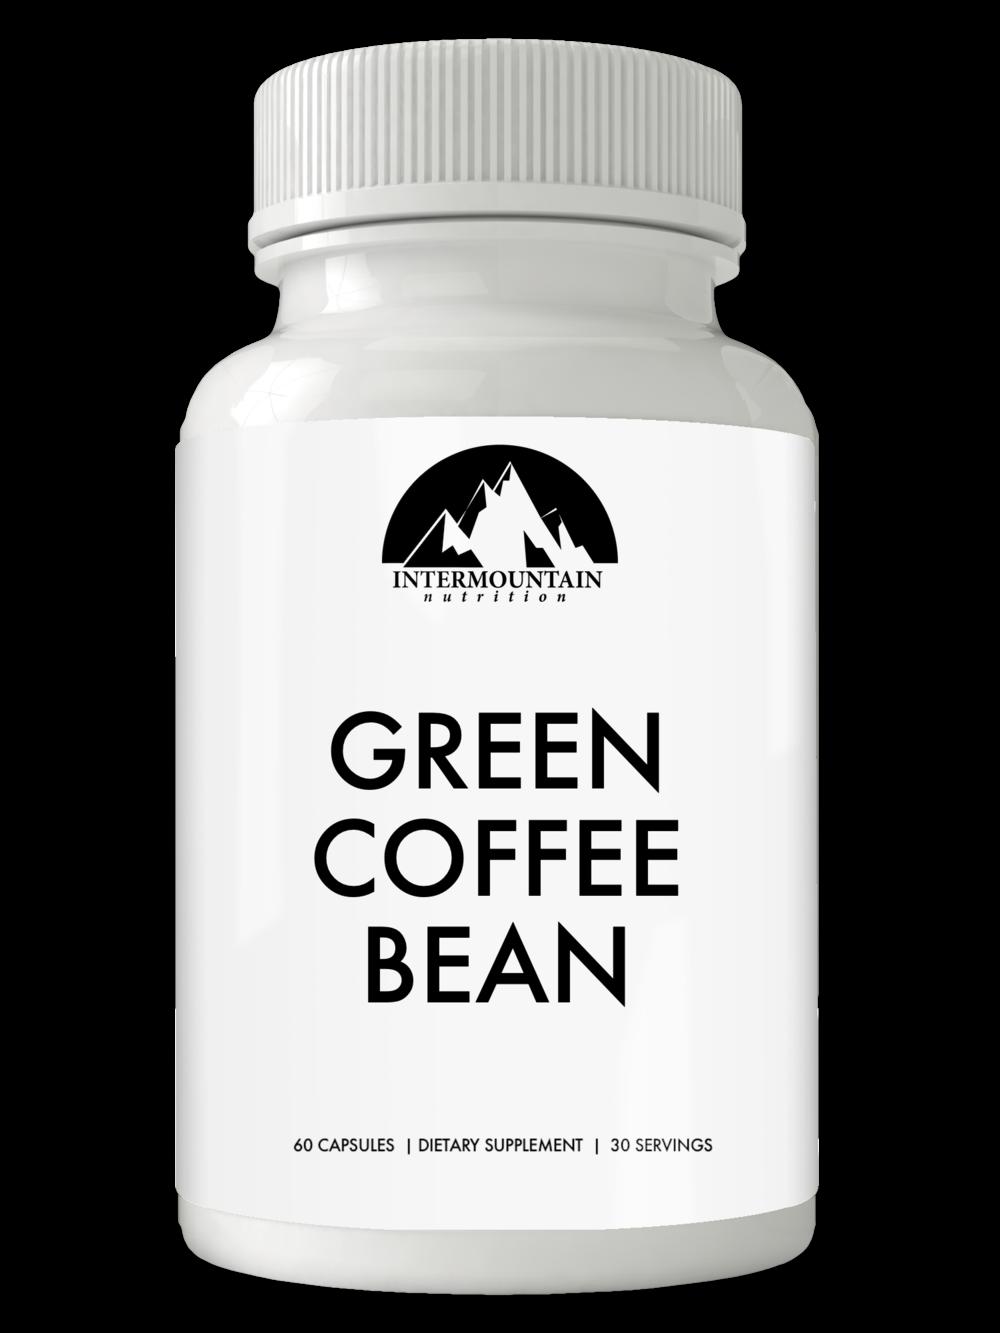 IMN GREEN COFFEE BEAN.png